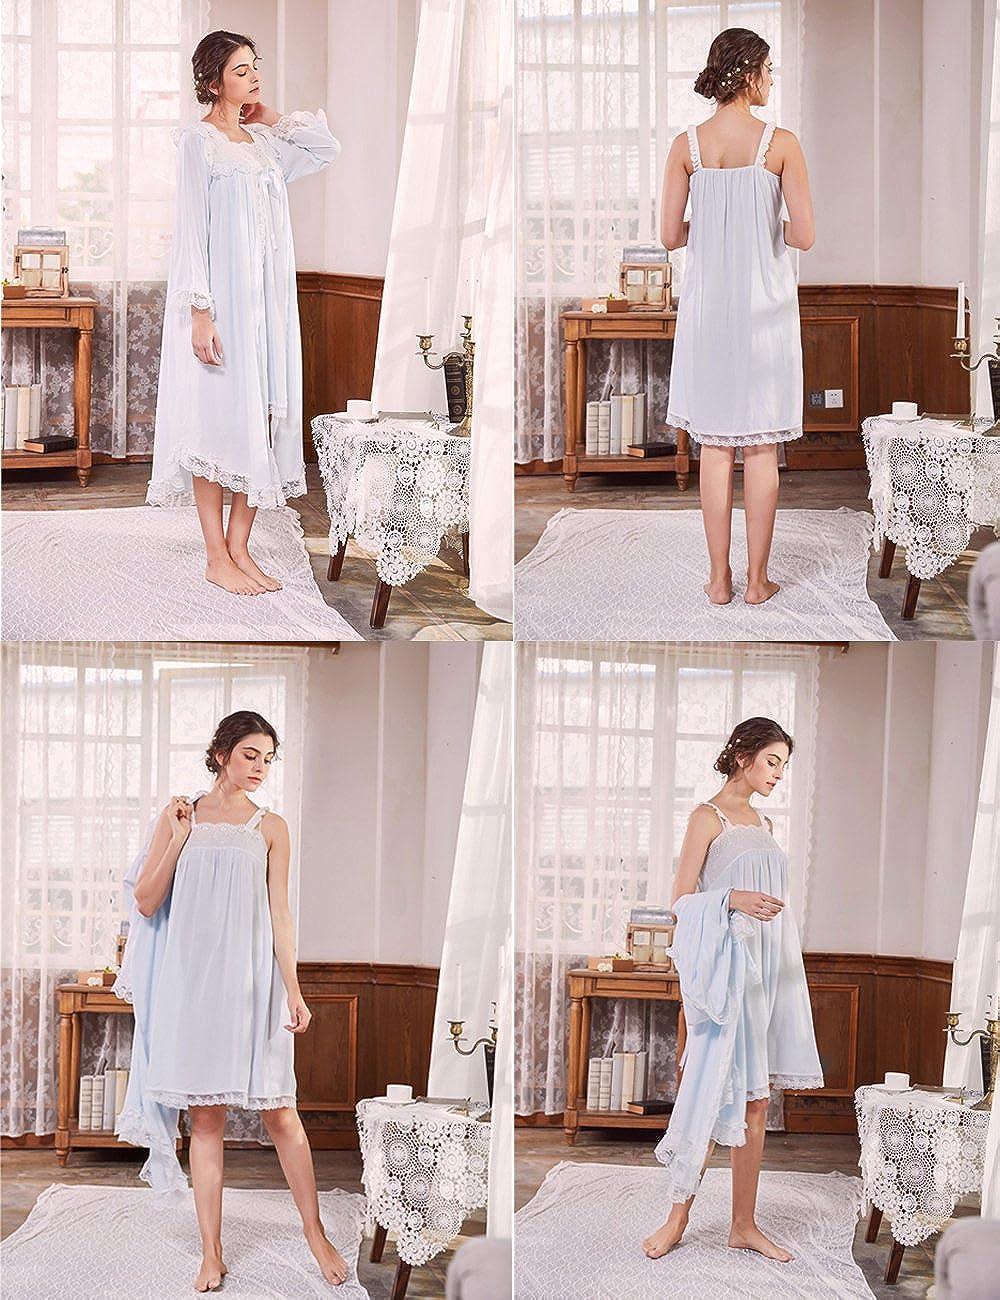 Aikosha Womens Retro Palace Style Full Flare Sleeve Two Piece Lace Cotton  Nightdress Set at Amazon Women s Clothing store  60863c3a9